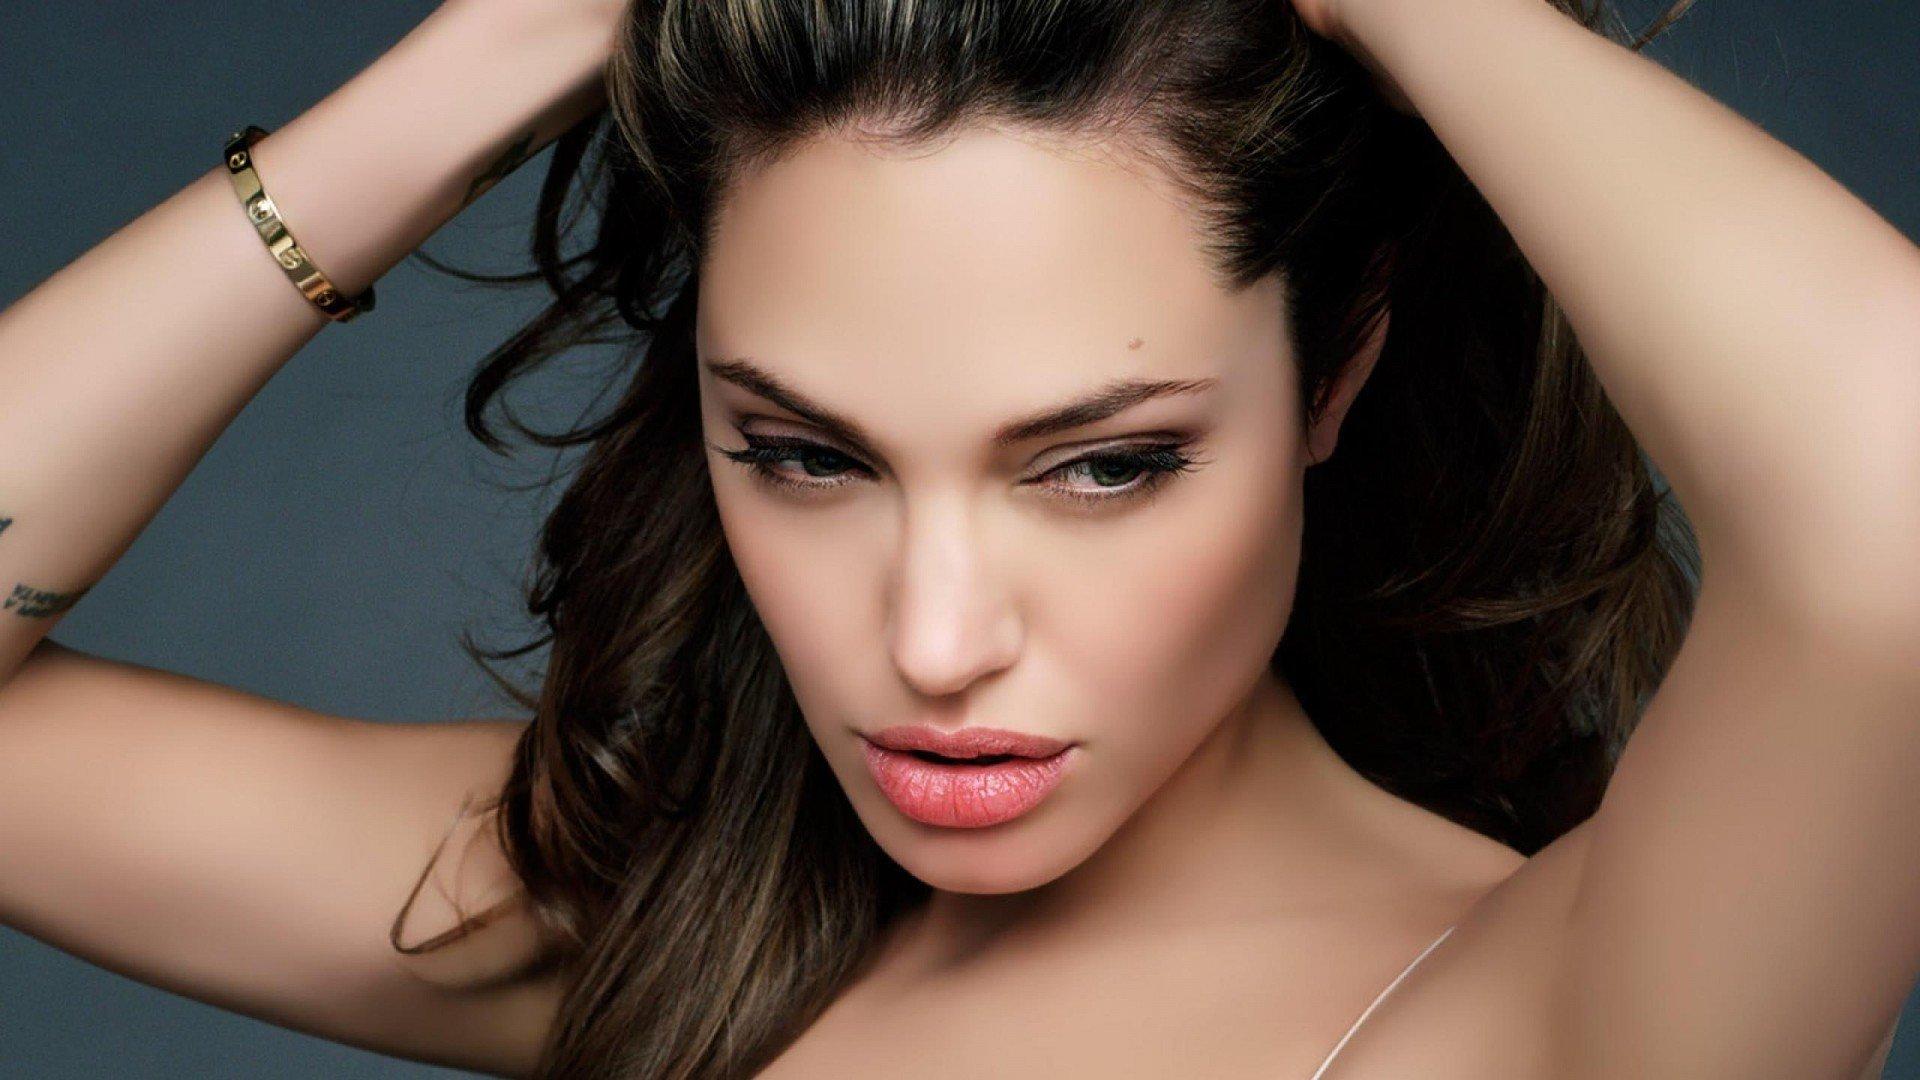 angelina jolie face, hd celebrities, 4k wallpapers, images